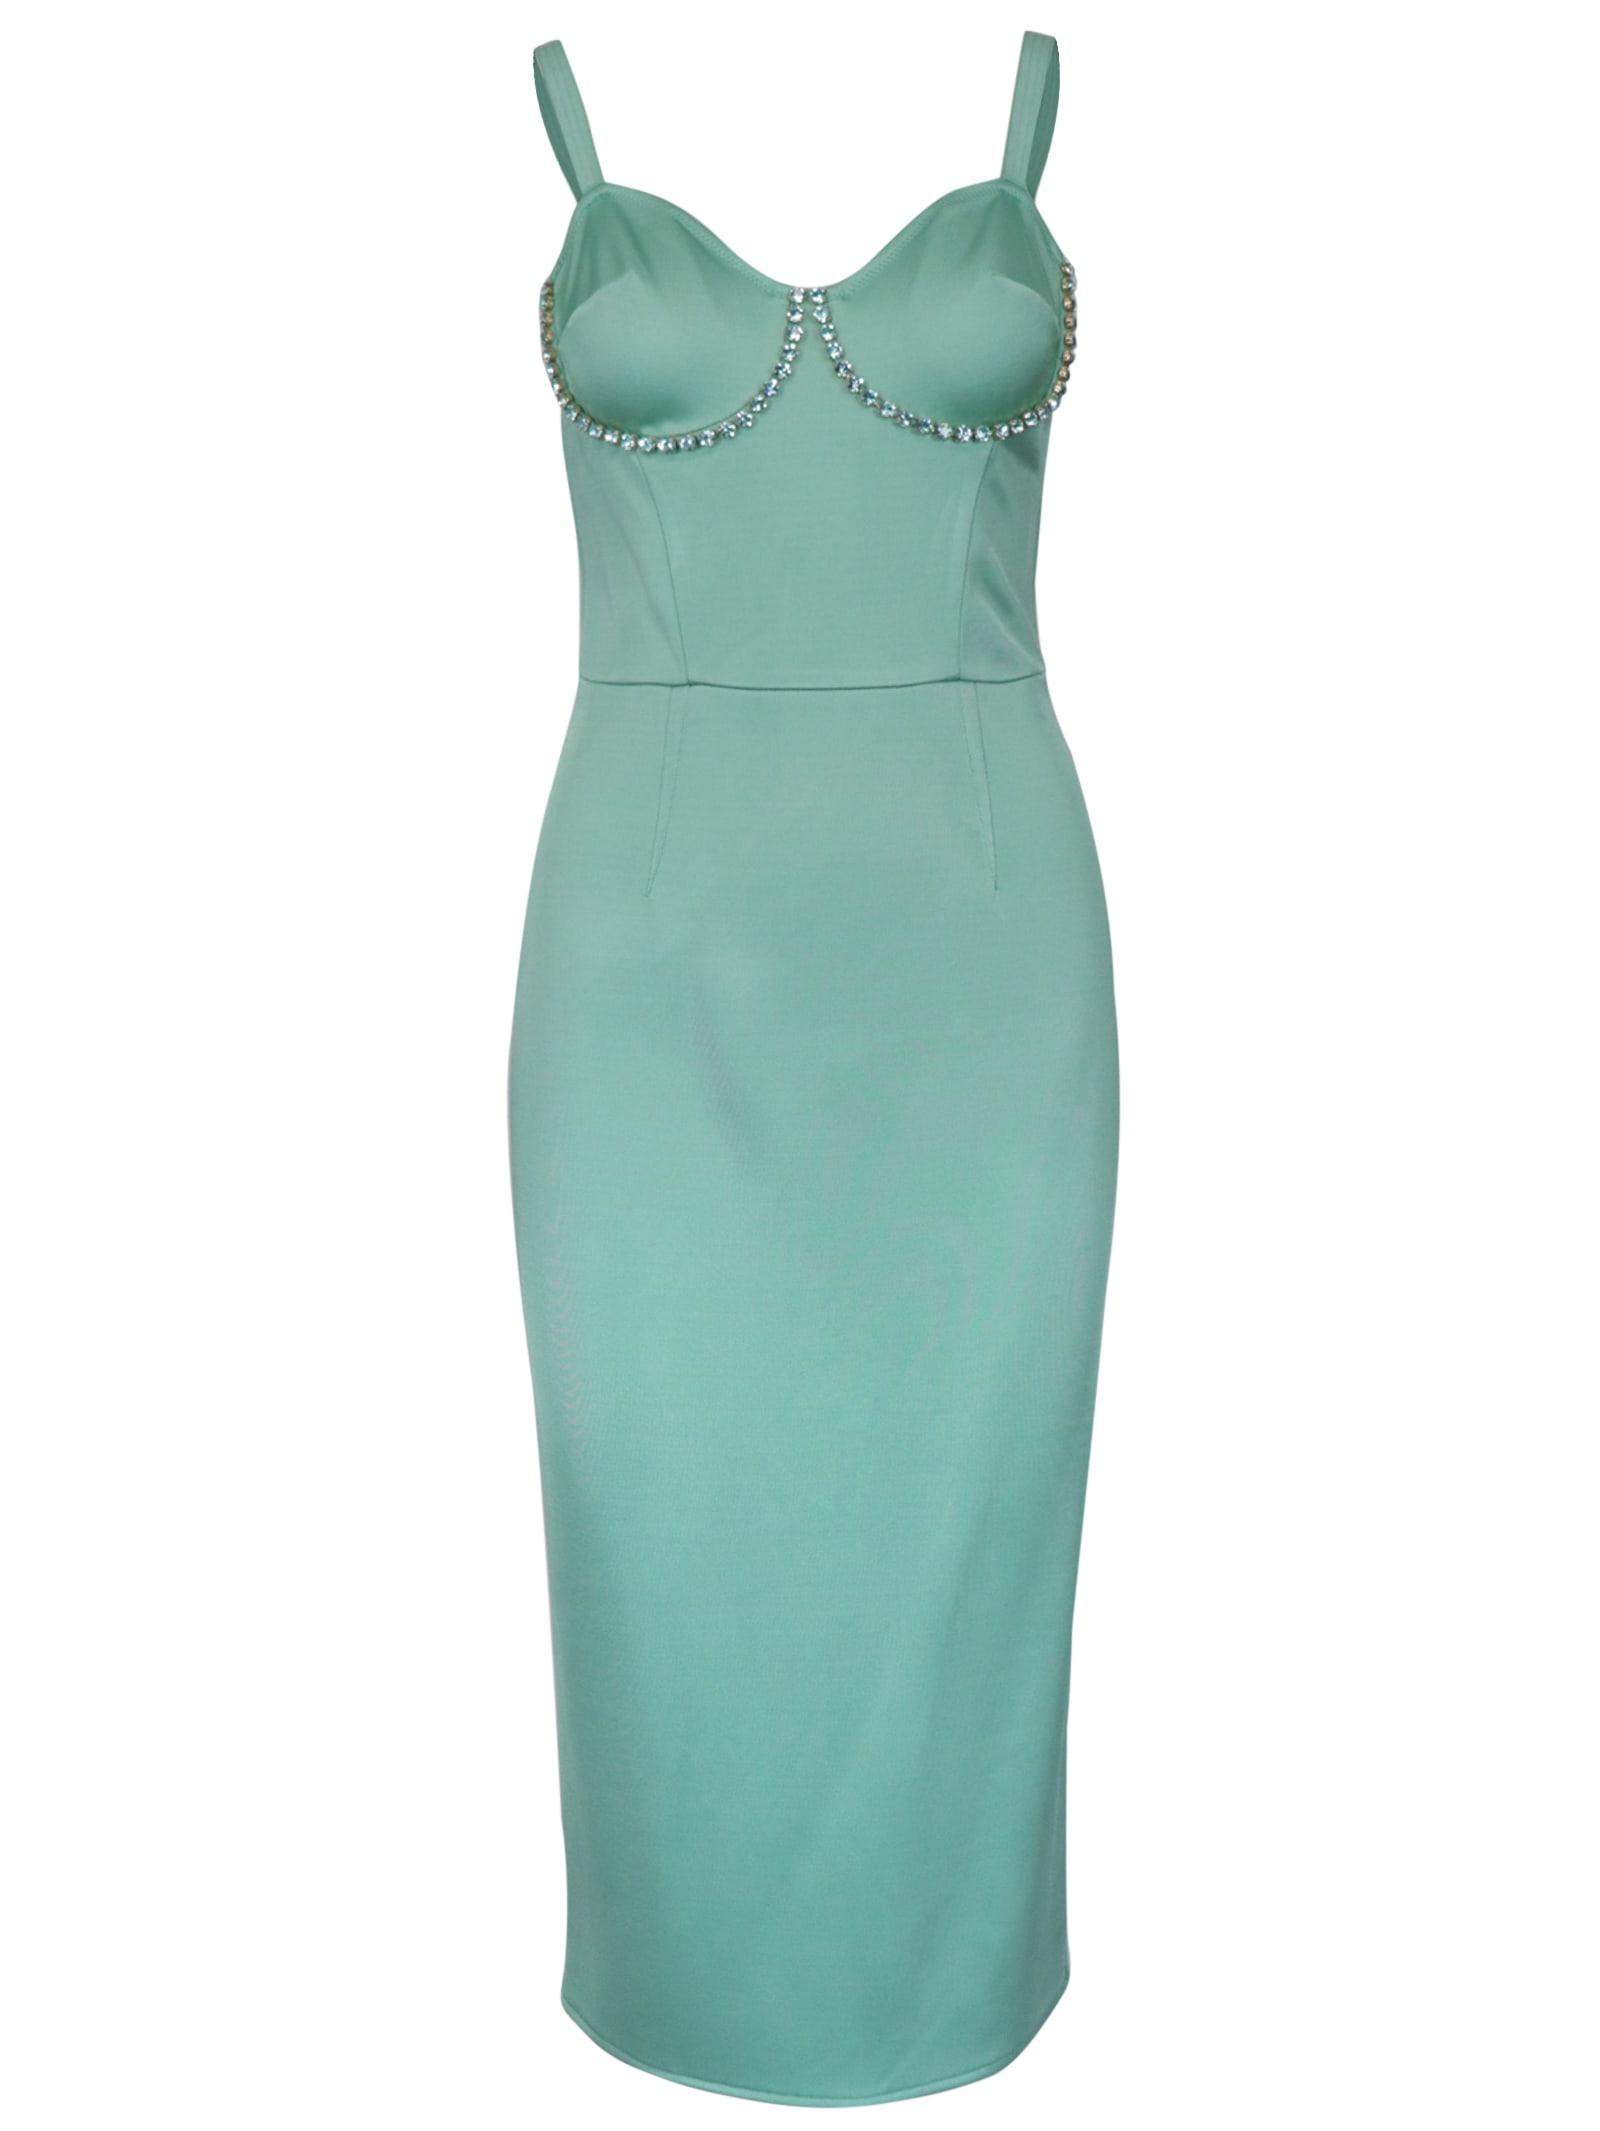 Buy Elisabetta Franchi Celyn B. Vyscose Longuettes Dress online, shop Elisabetta Franchi Celyn B. with free shipping